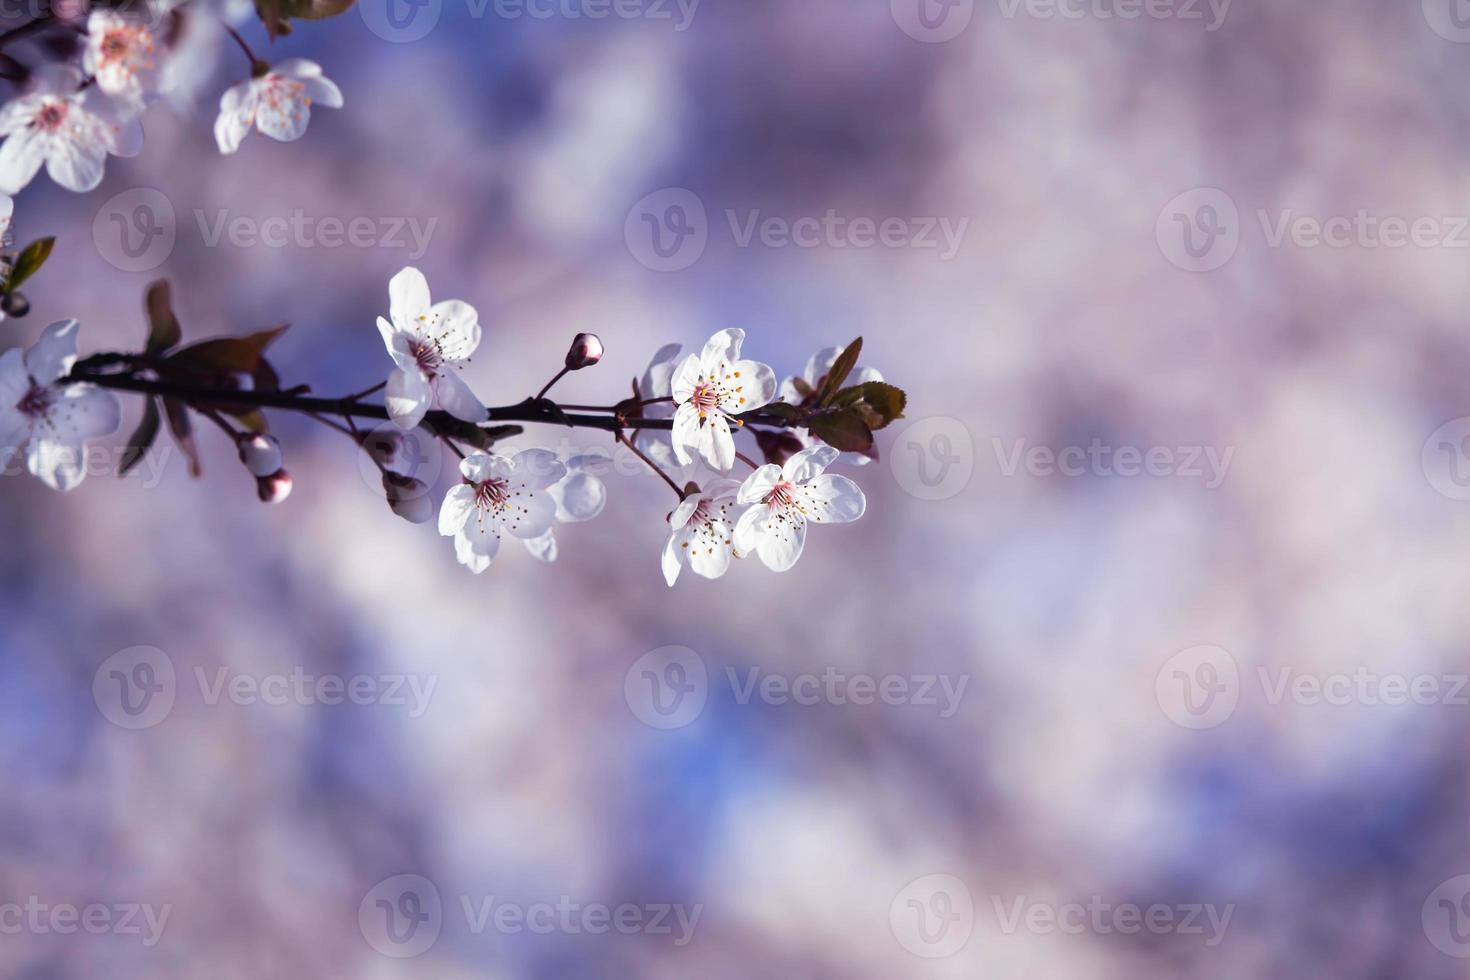 florecer foto